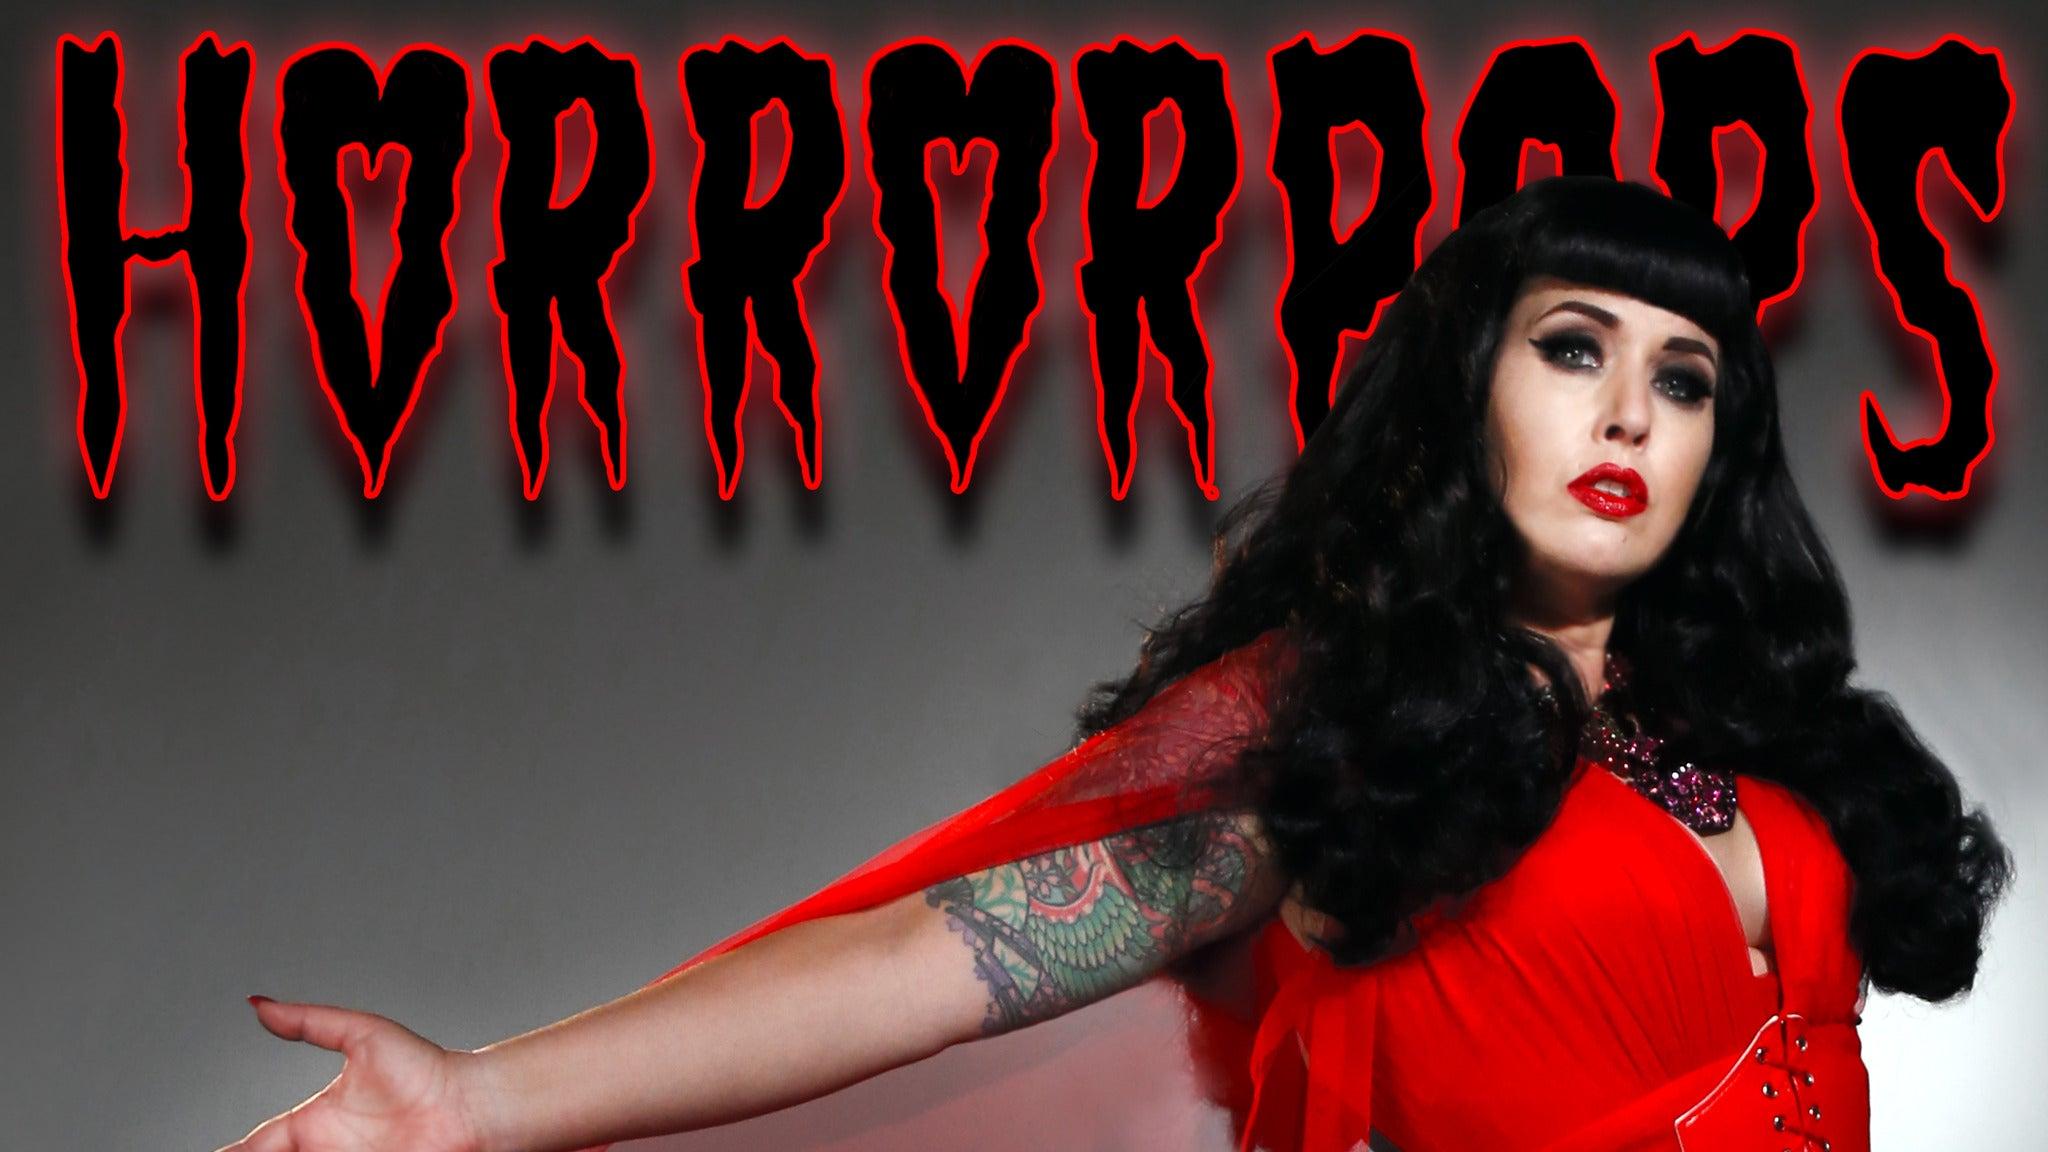 Horrorpops pre-sale password for early tickets in Las Vegas